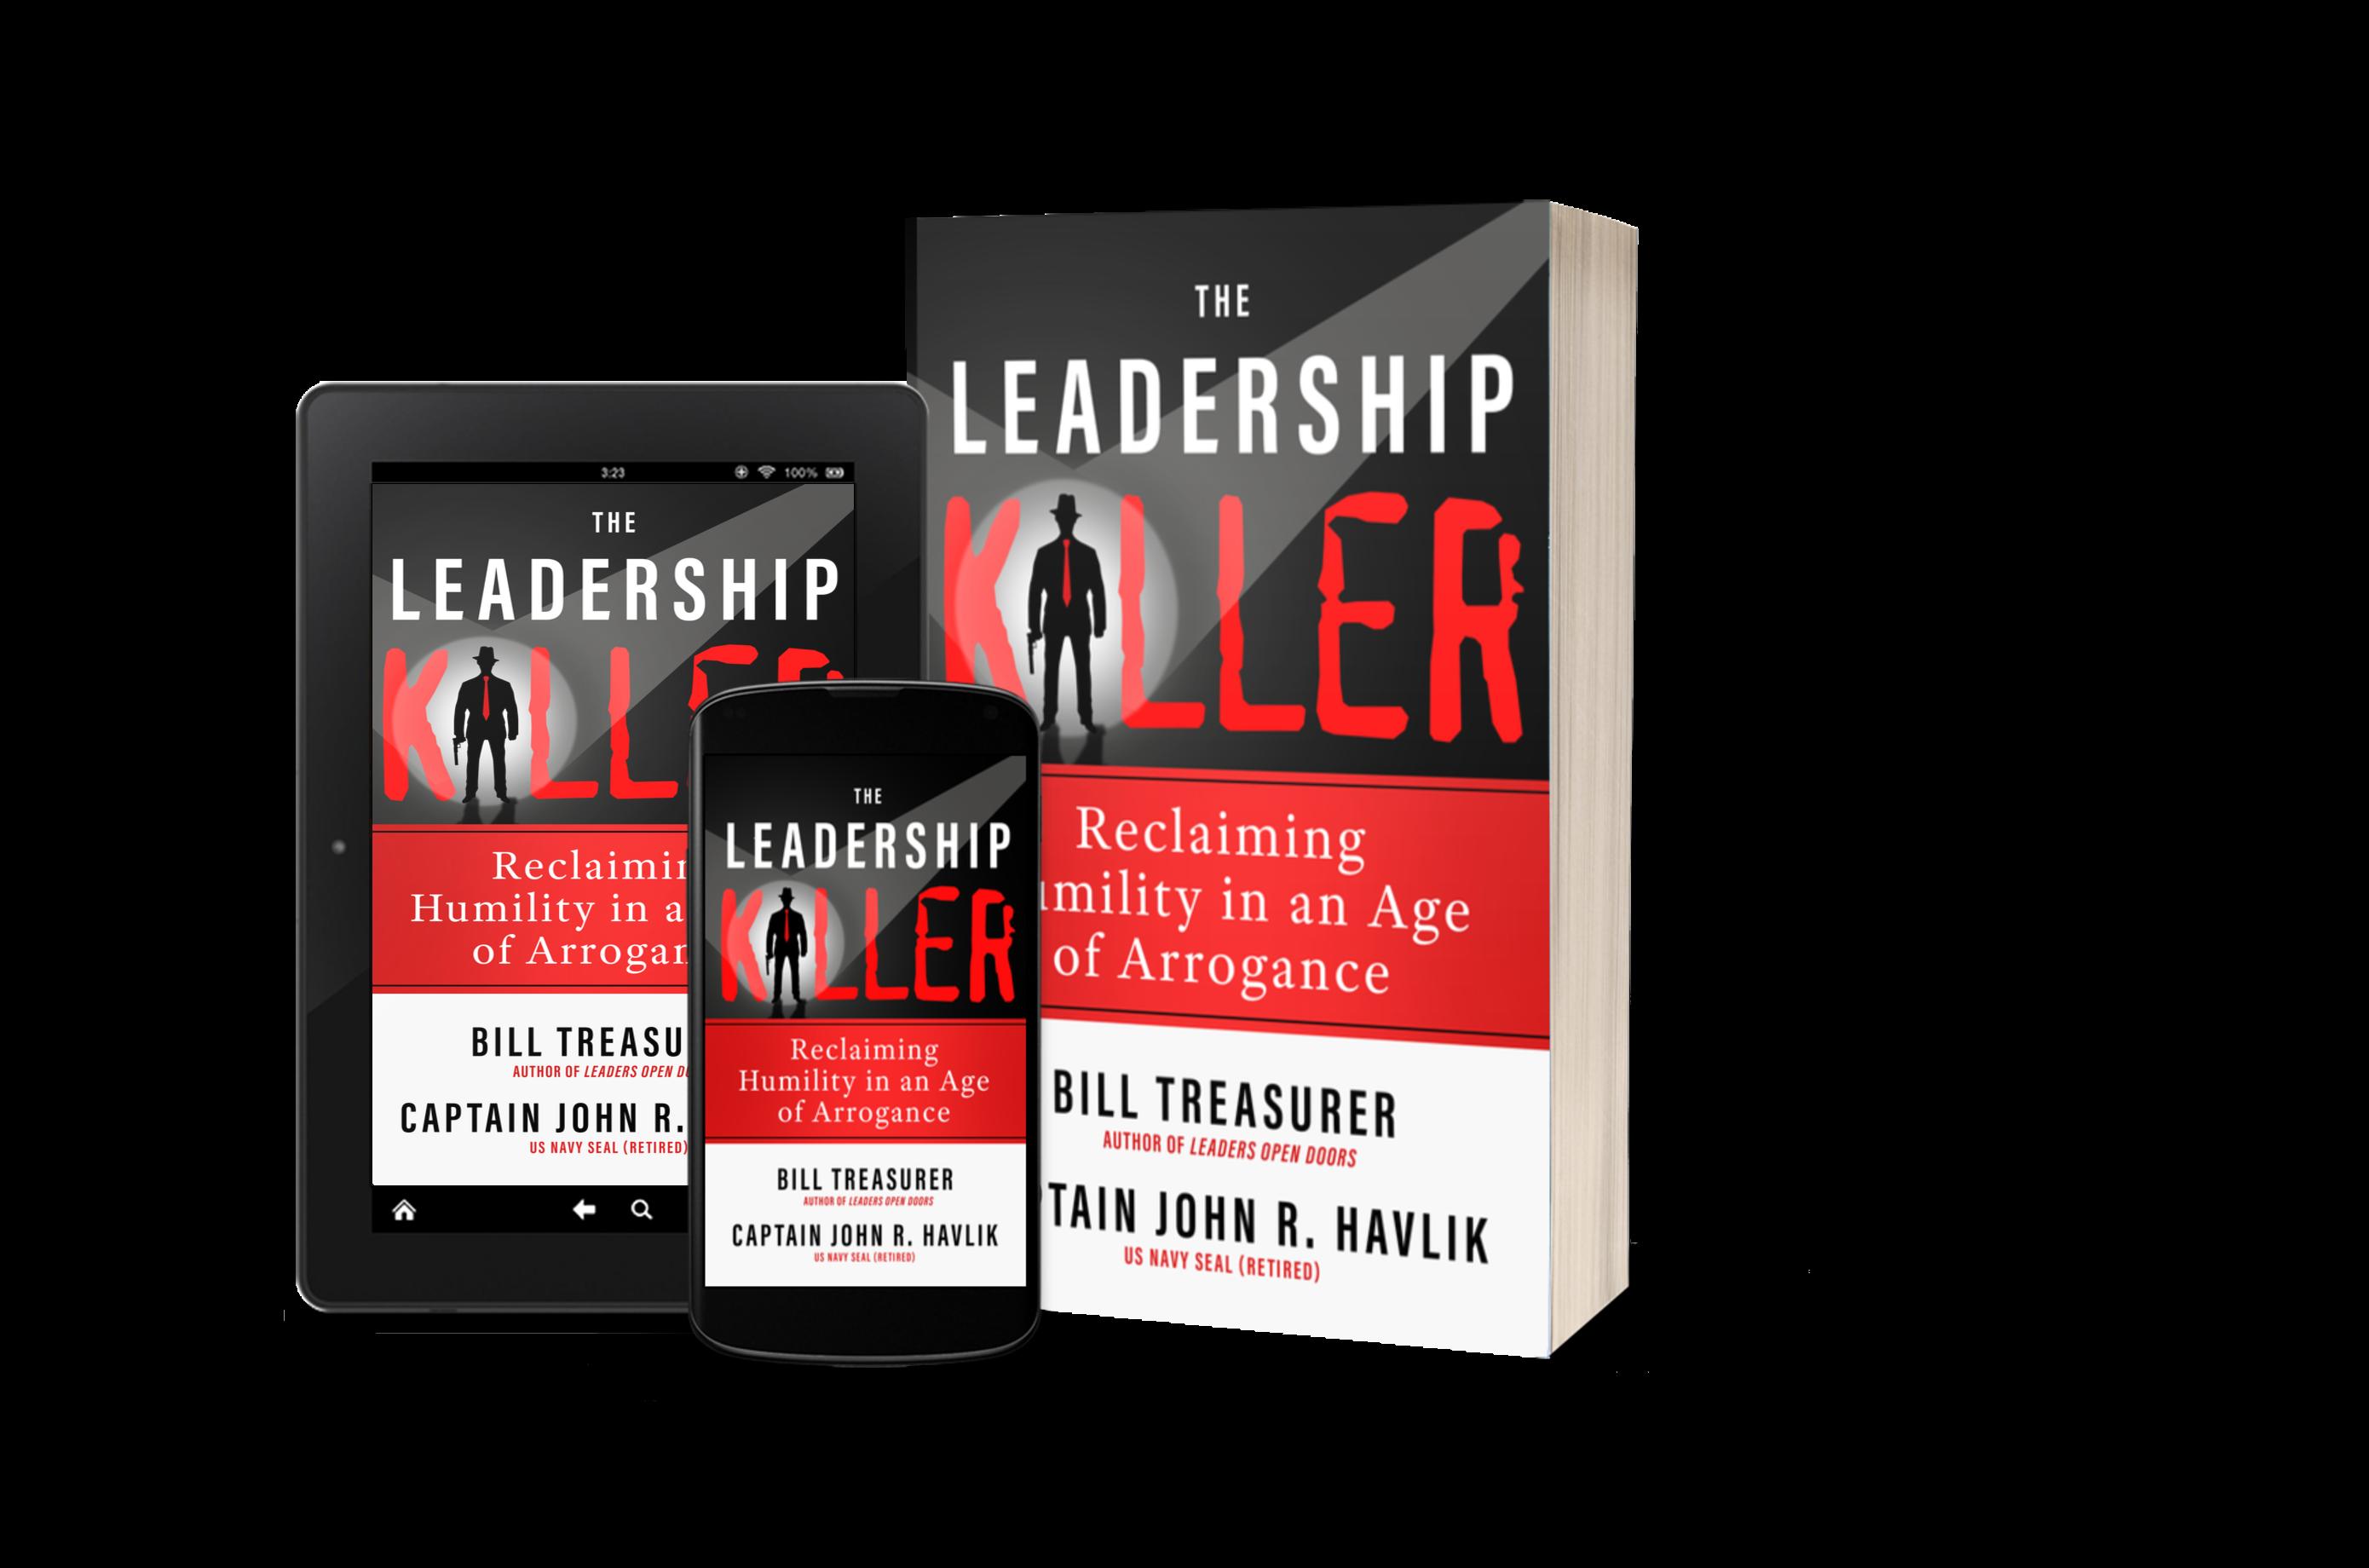 Various versions of The Leadership Killer book.